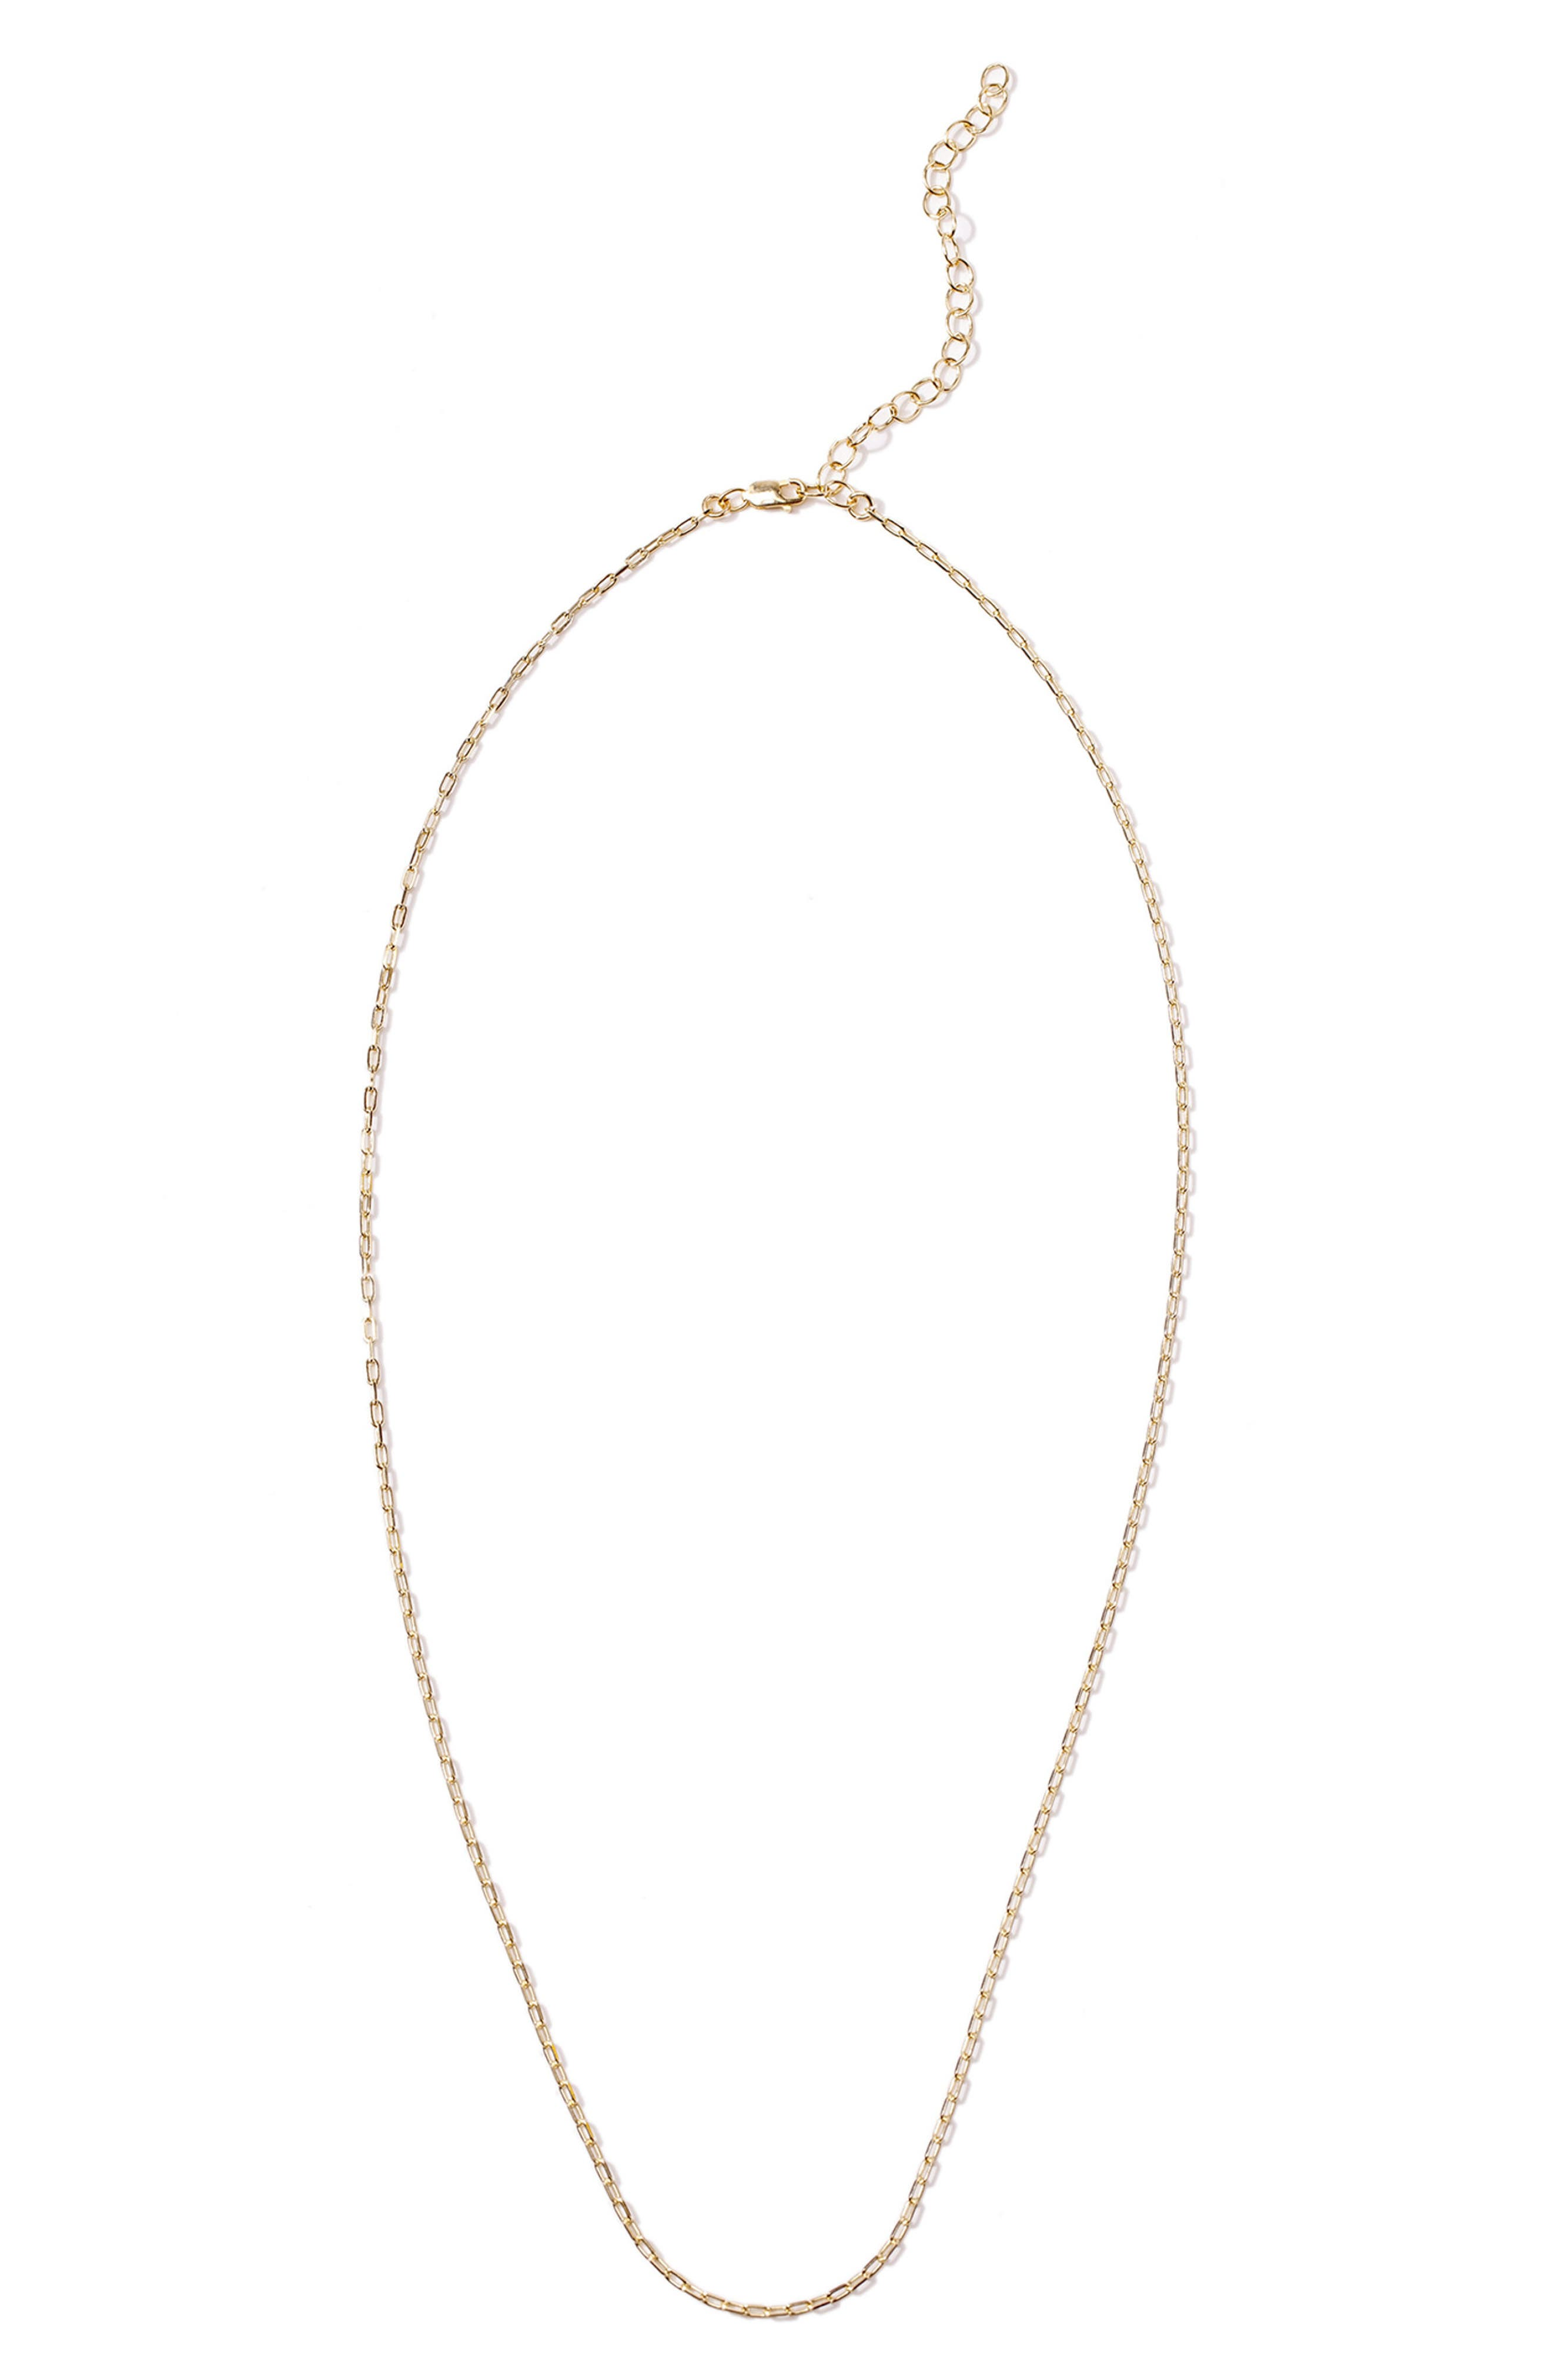 Petalbox Link Necklace,                             Alternate thumbnail 7, color,                             Gold